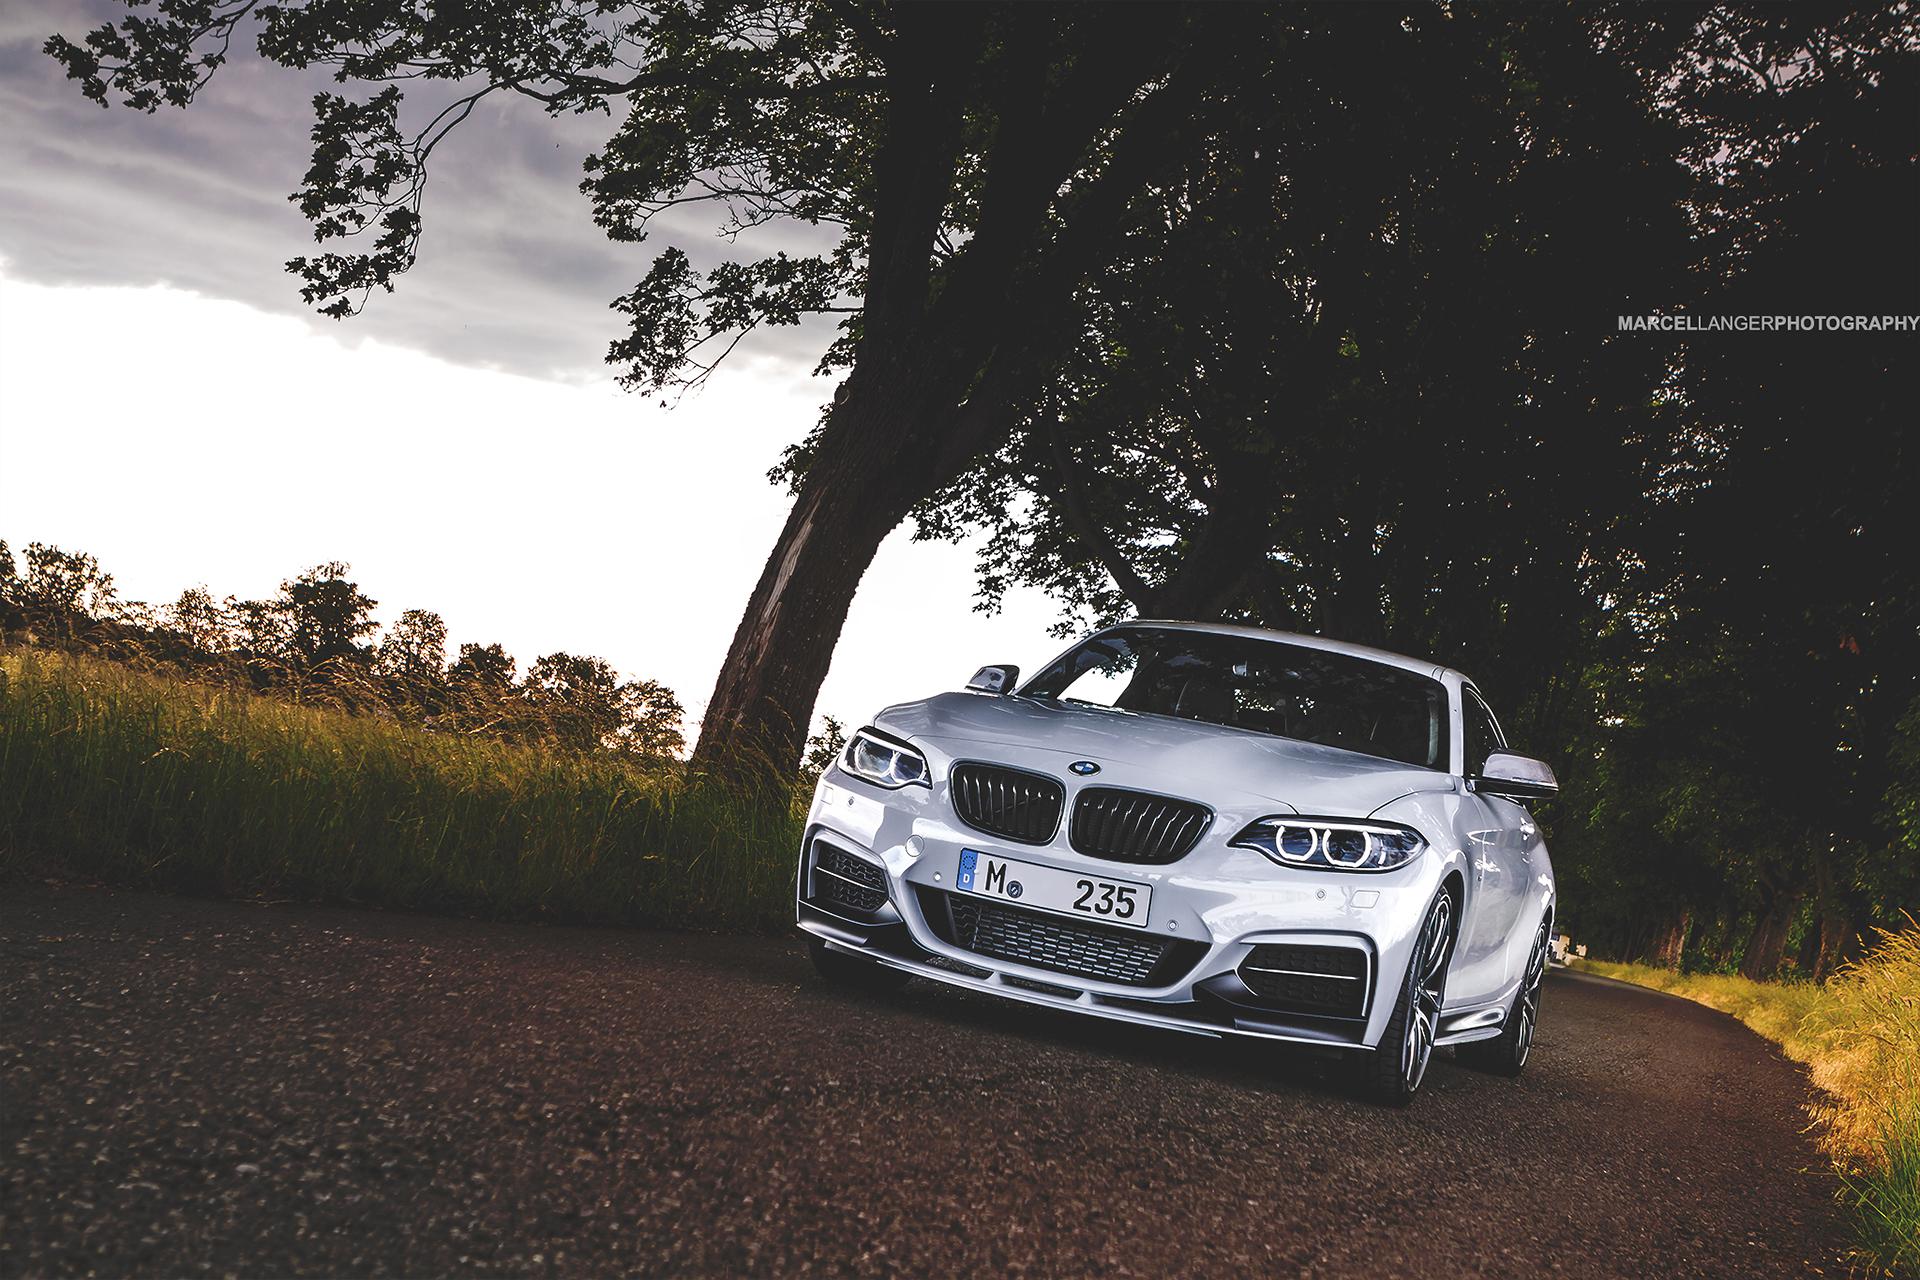 Alpine White M Performance Bmw M235i Looks Stunning